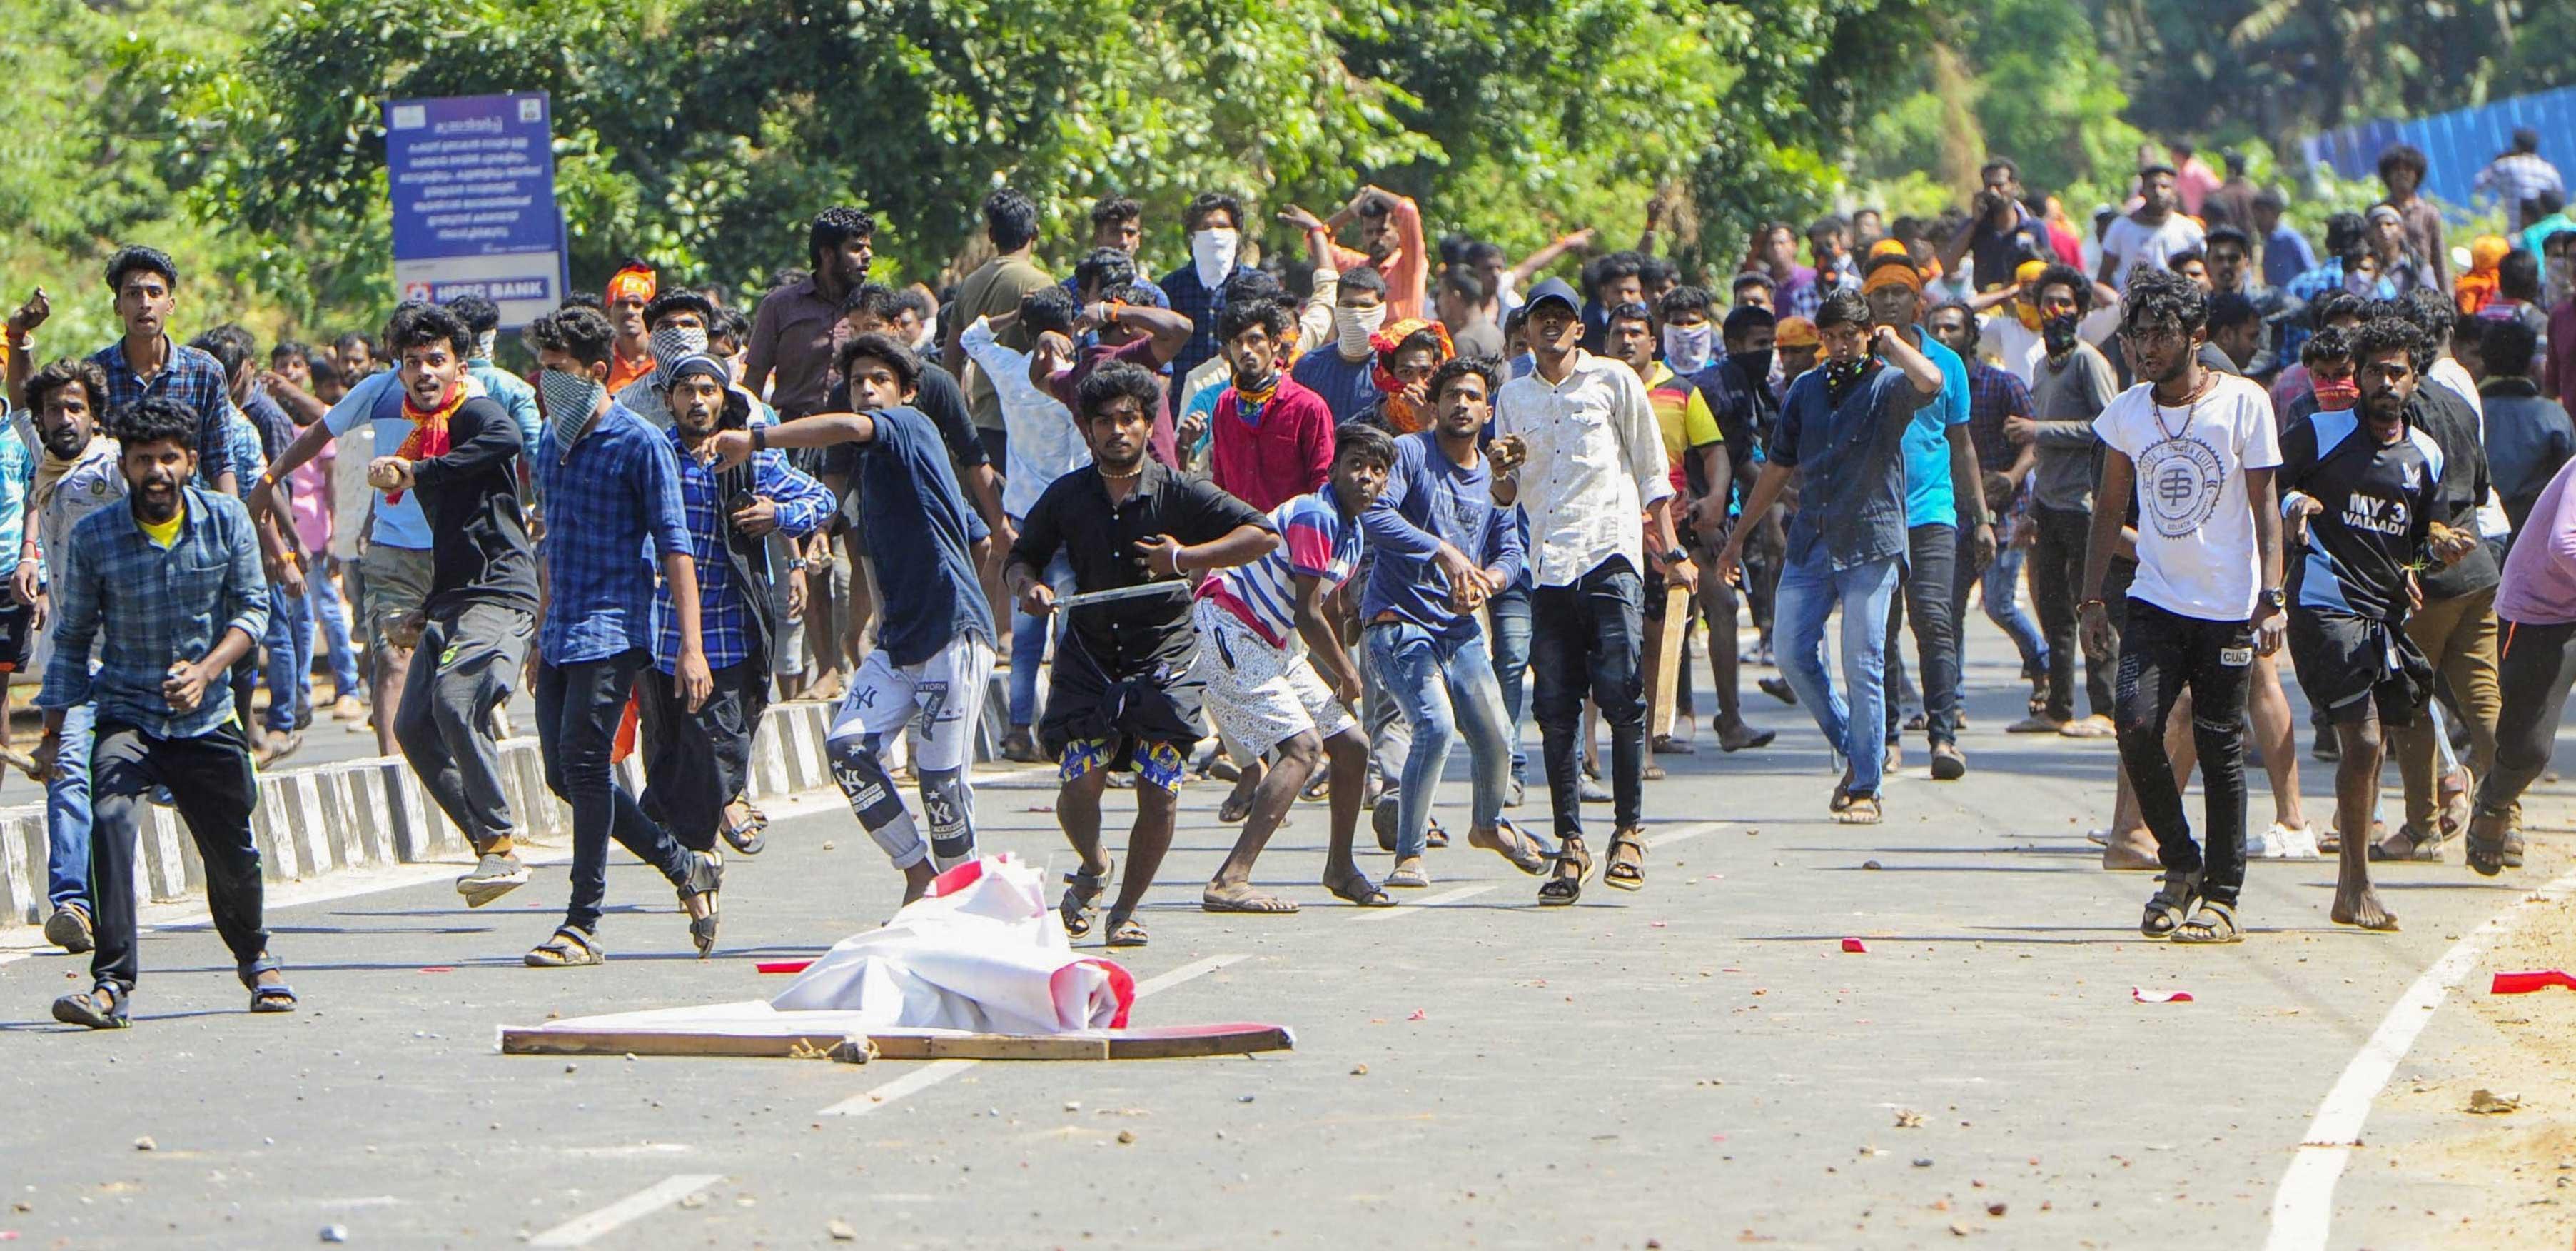 Parivar plays with Kerala fire as it tries to enforce a shutdown